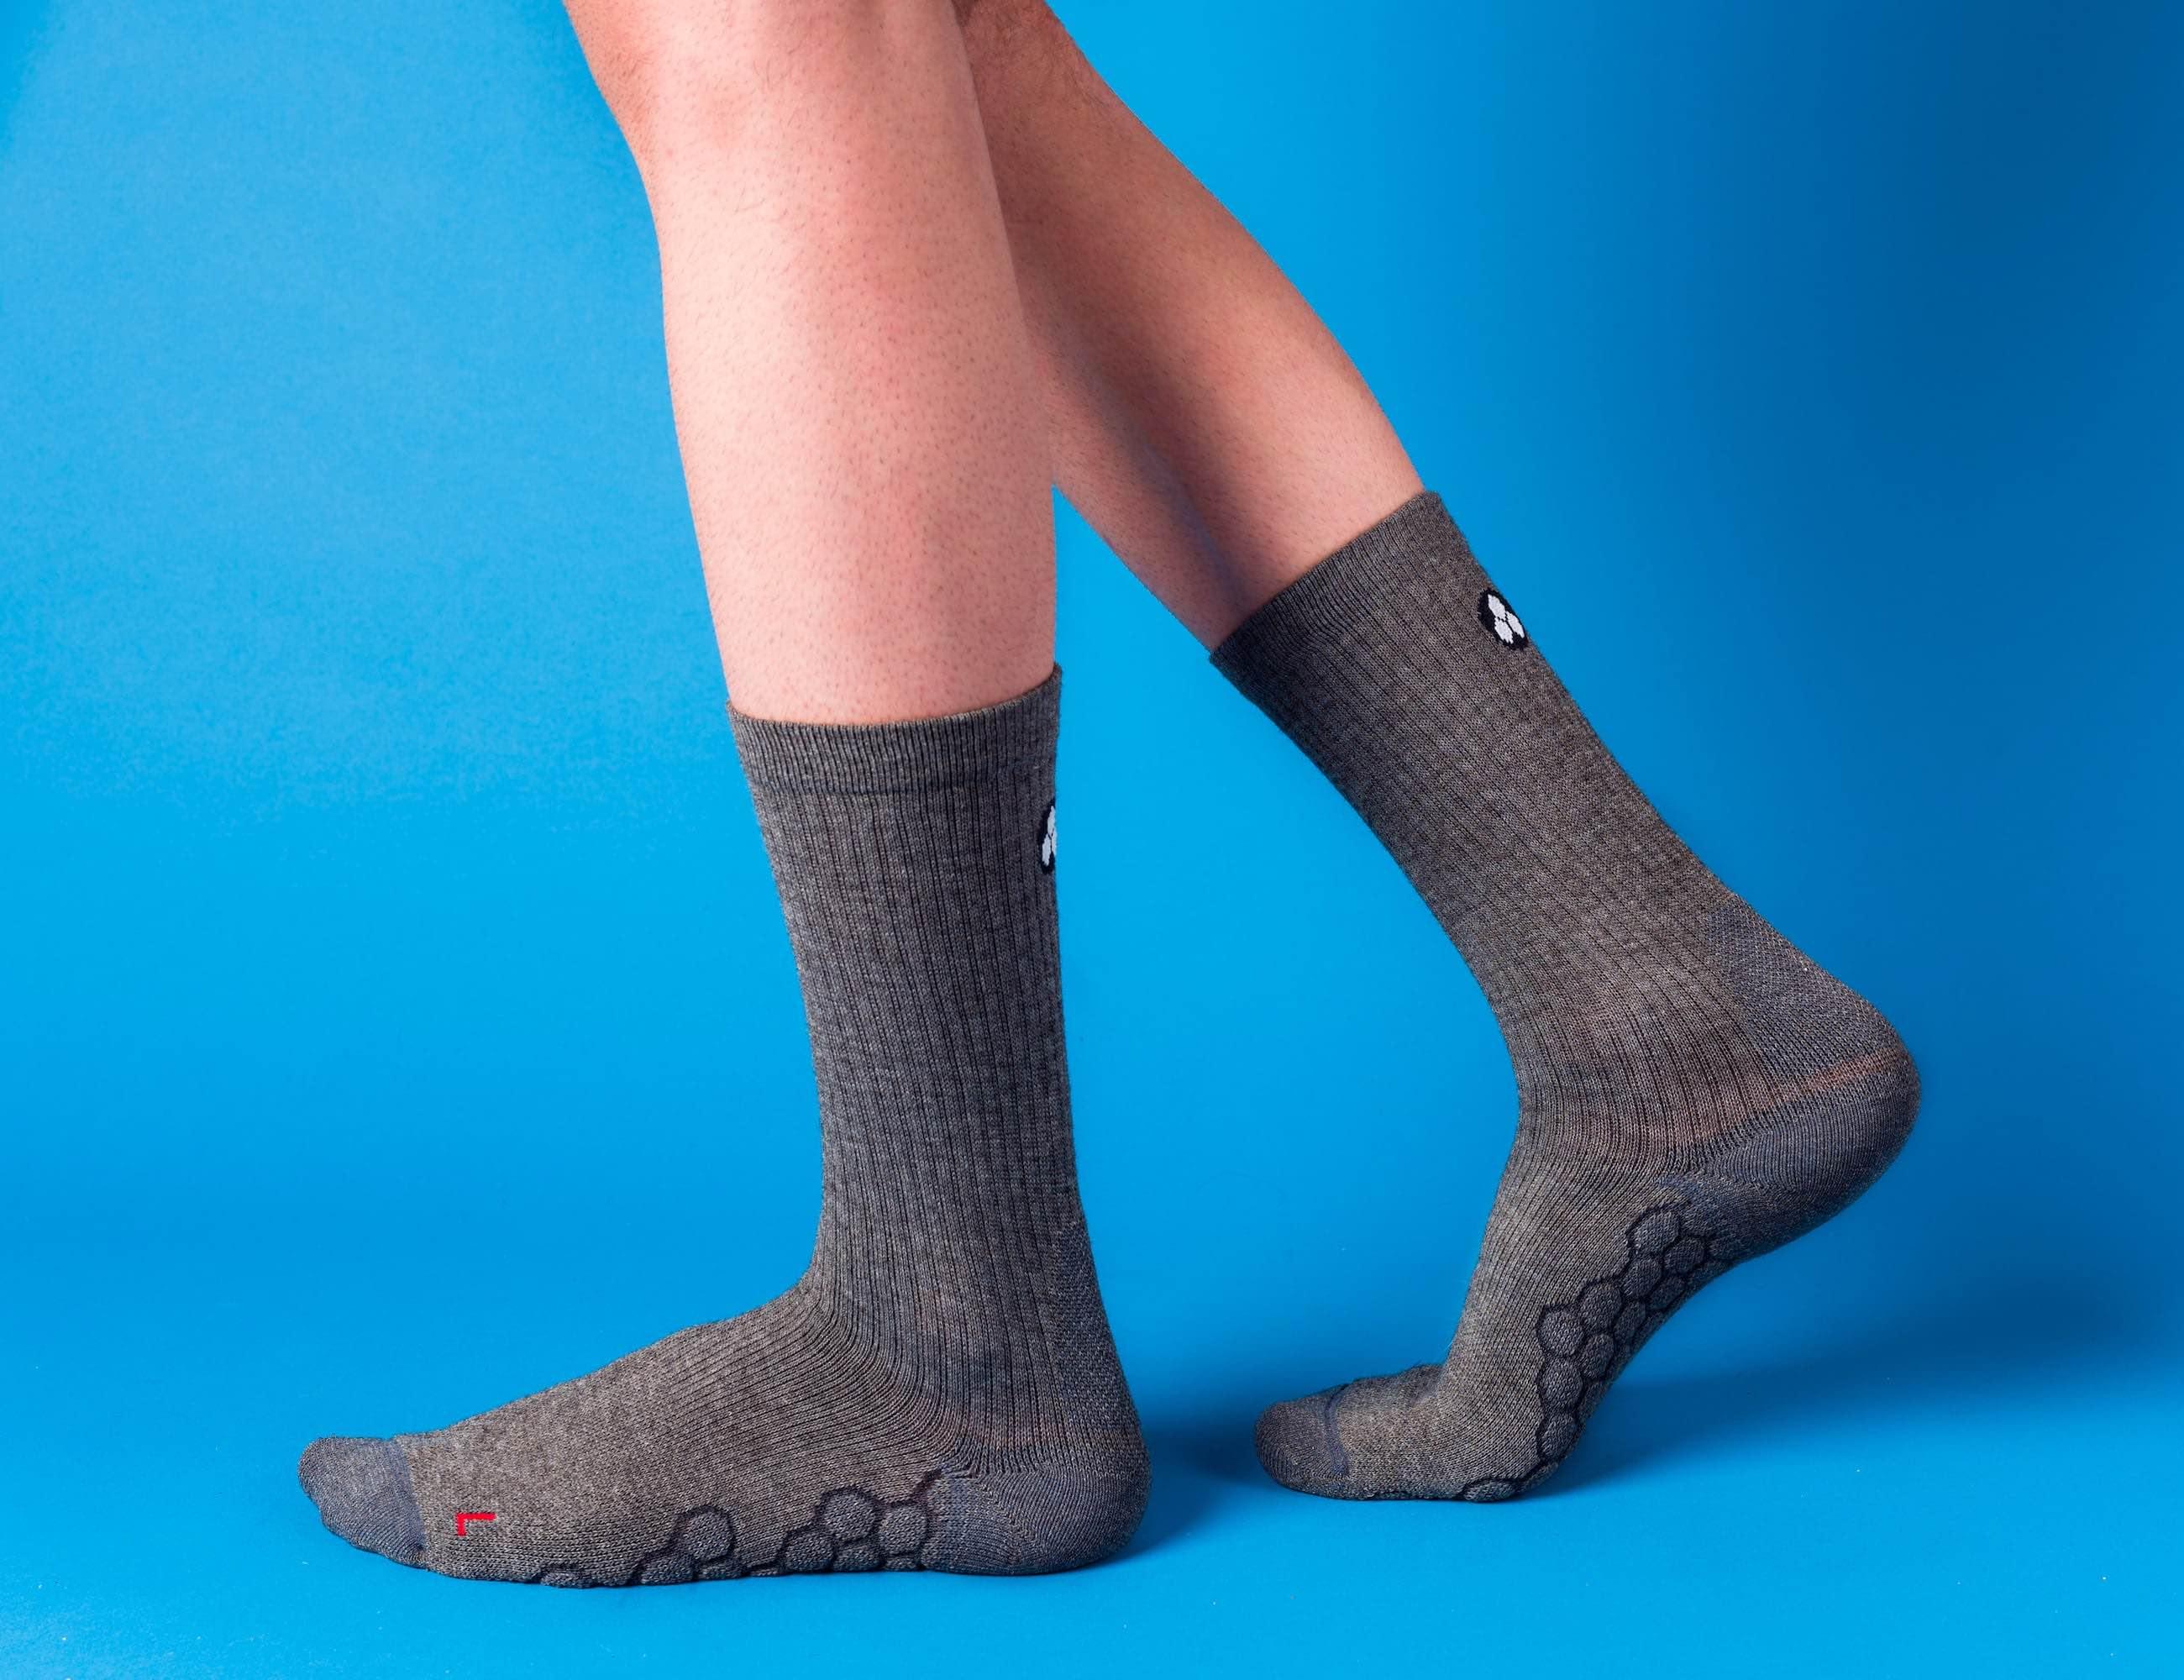 NEVERQUIT Elevated Merino Socks